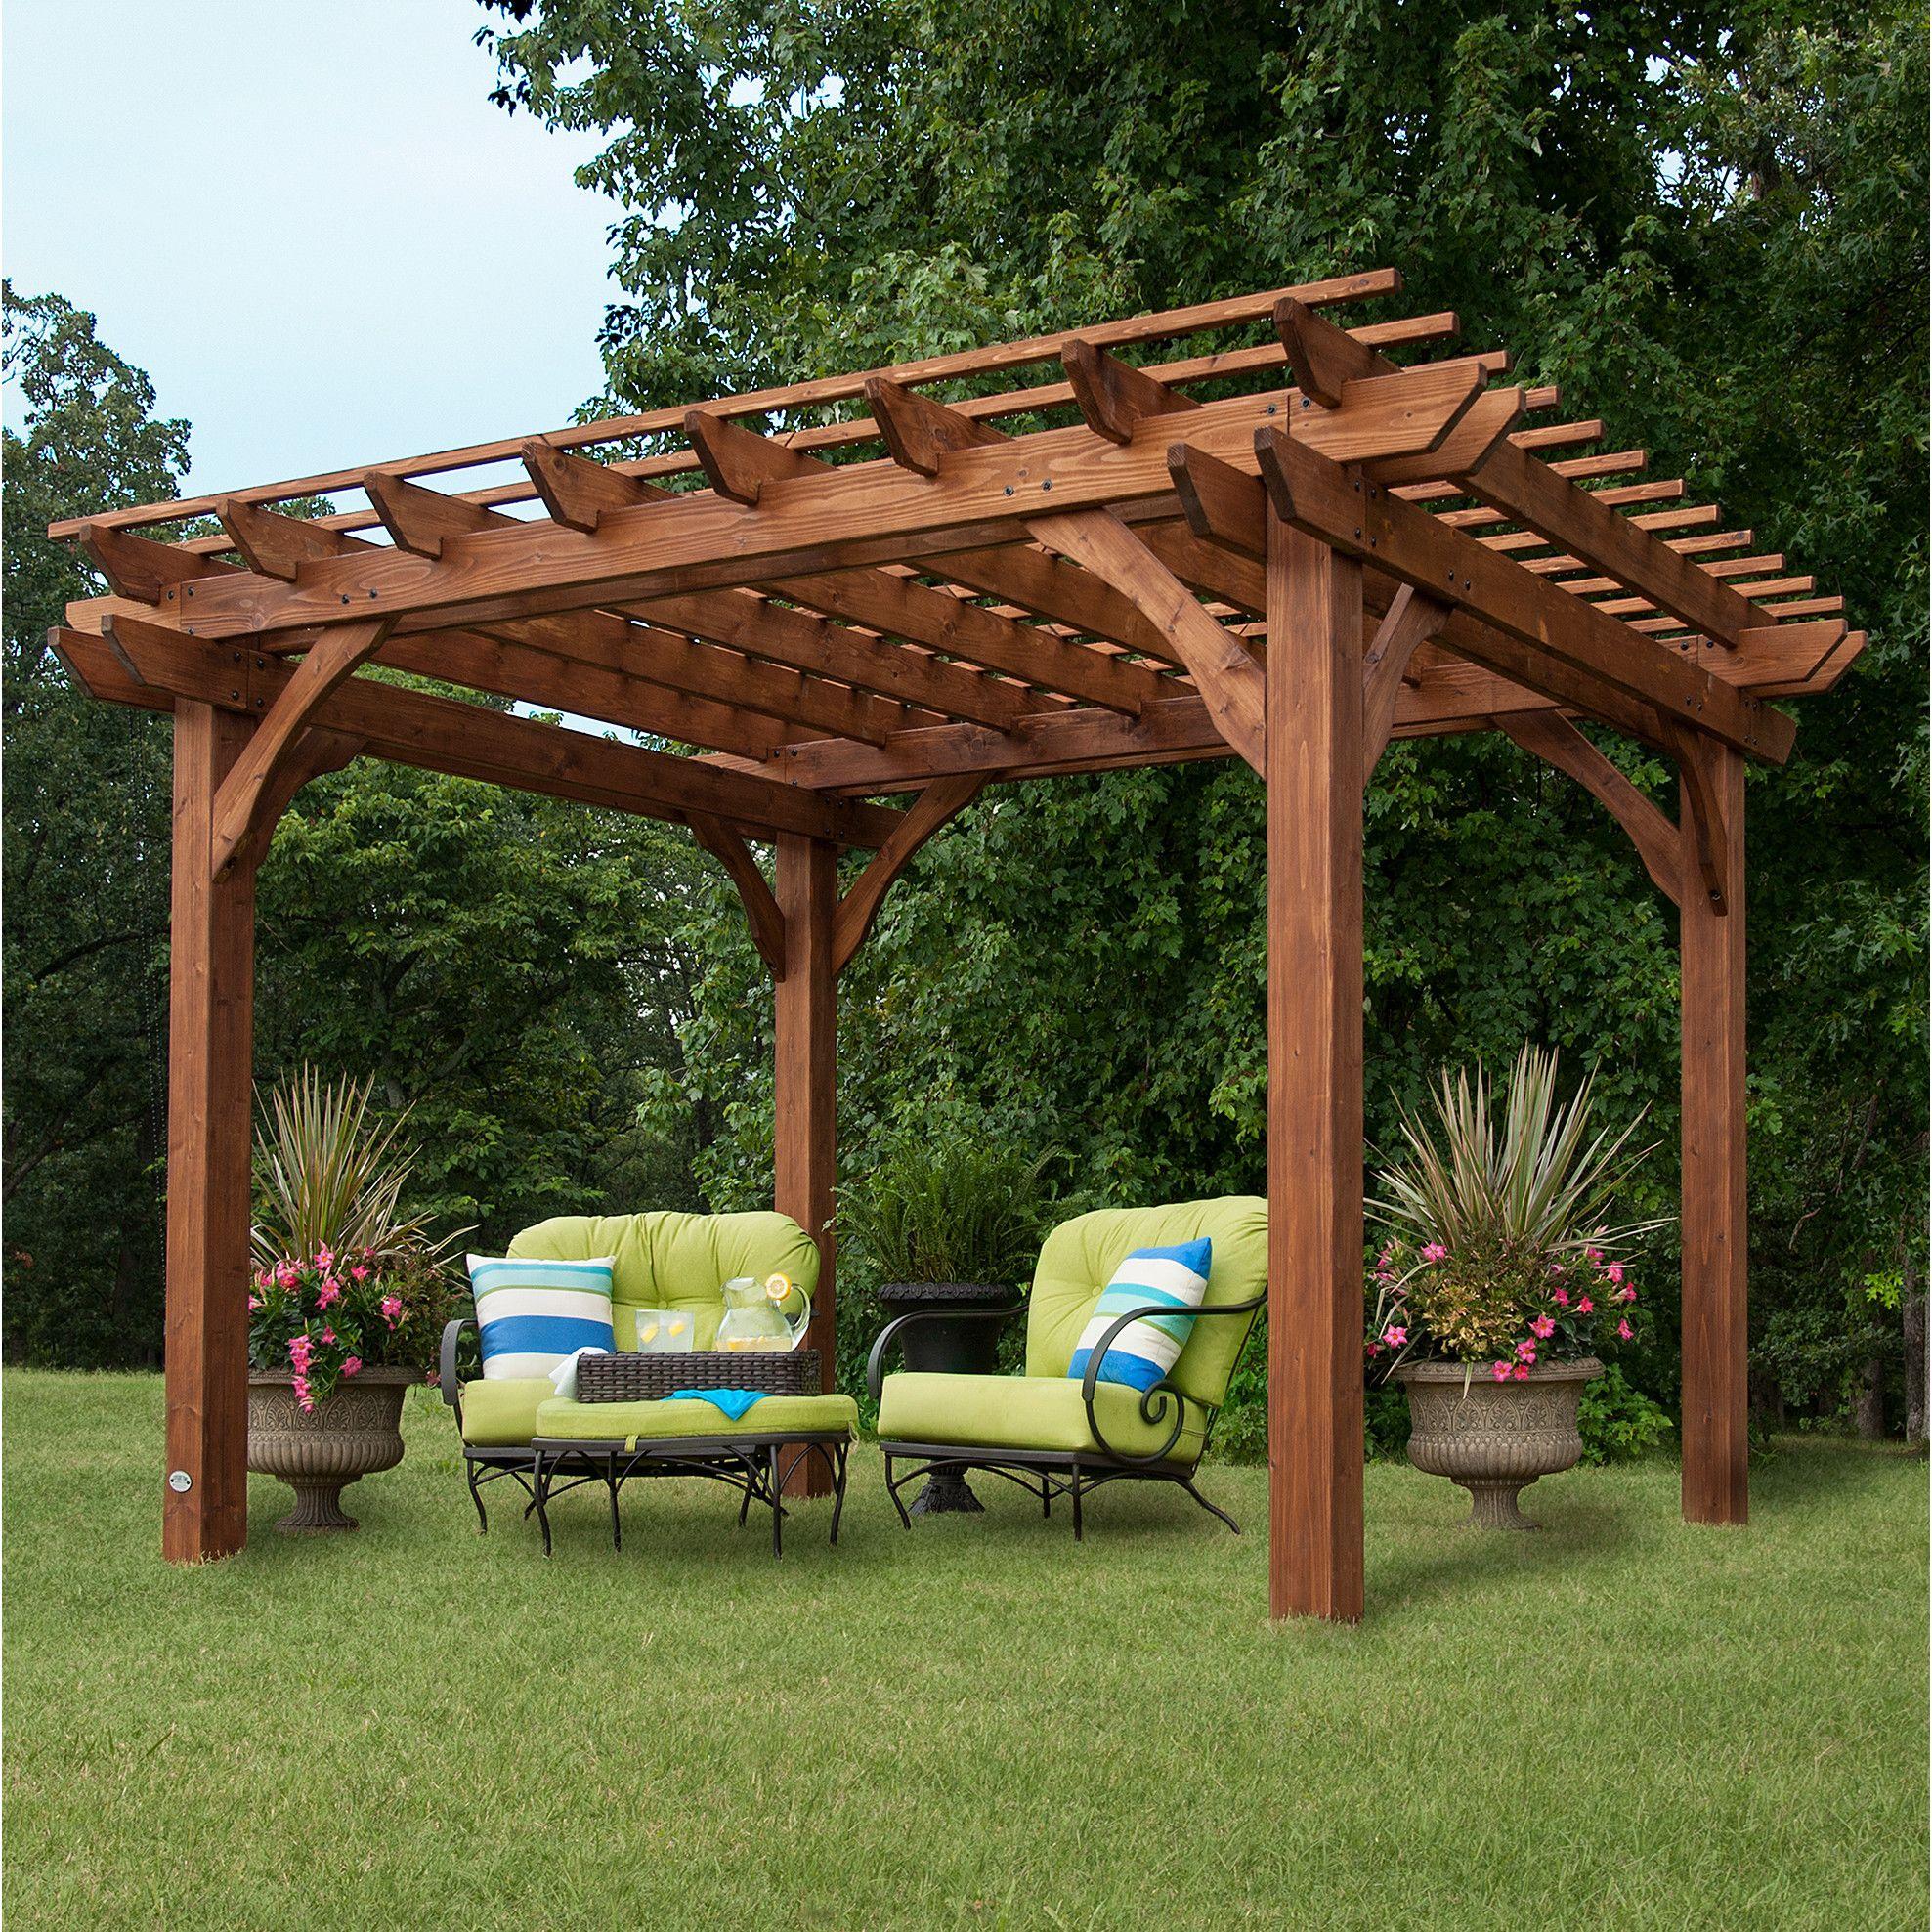 Cedar 12 Ft W X 10 Ft D Solid Wood Pergola Backyard Pergola Outdoor Pergola Wood Pergola